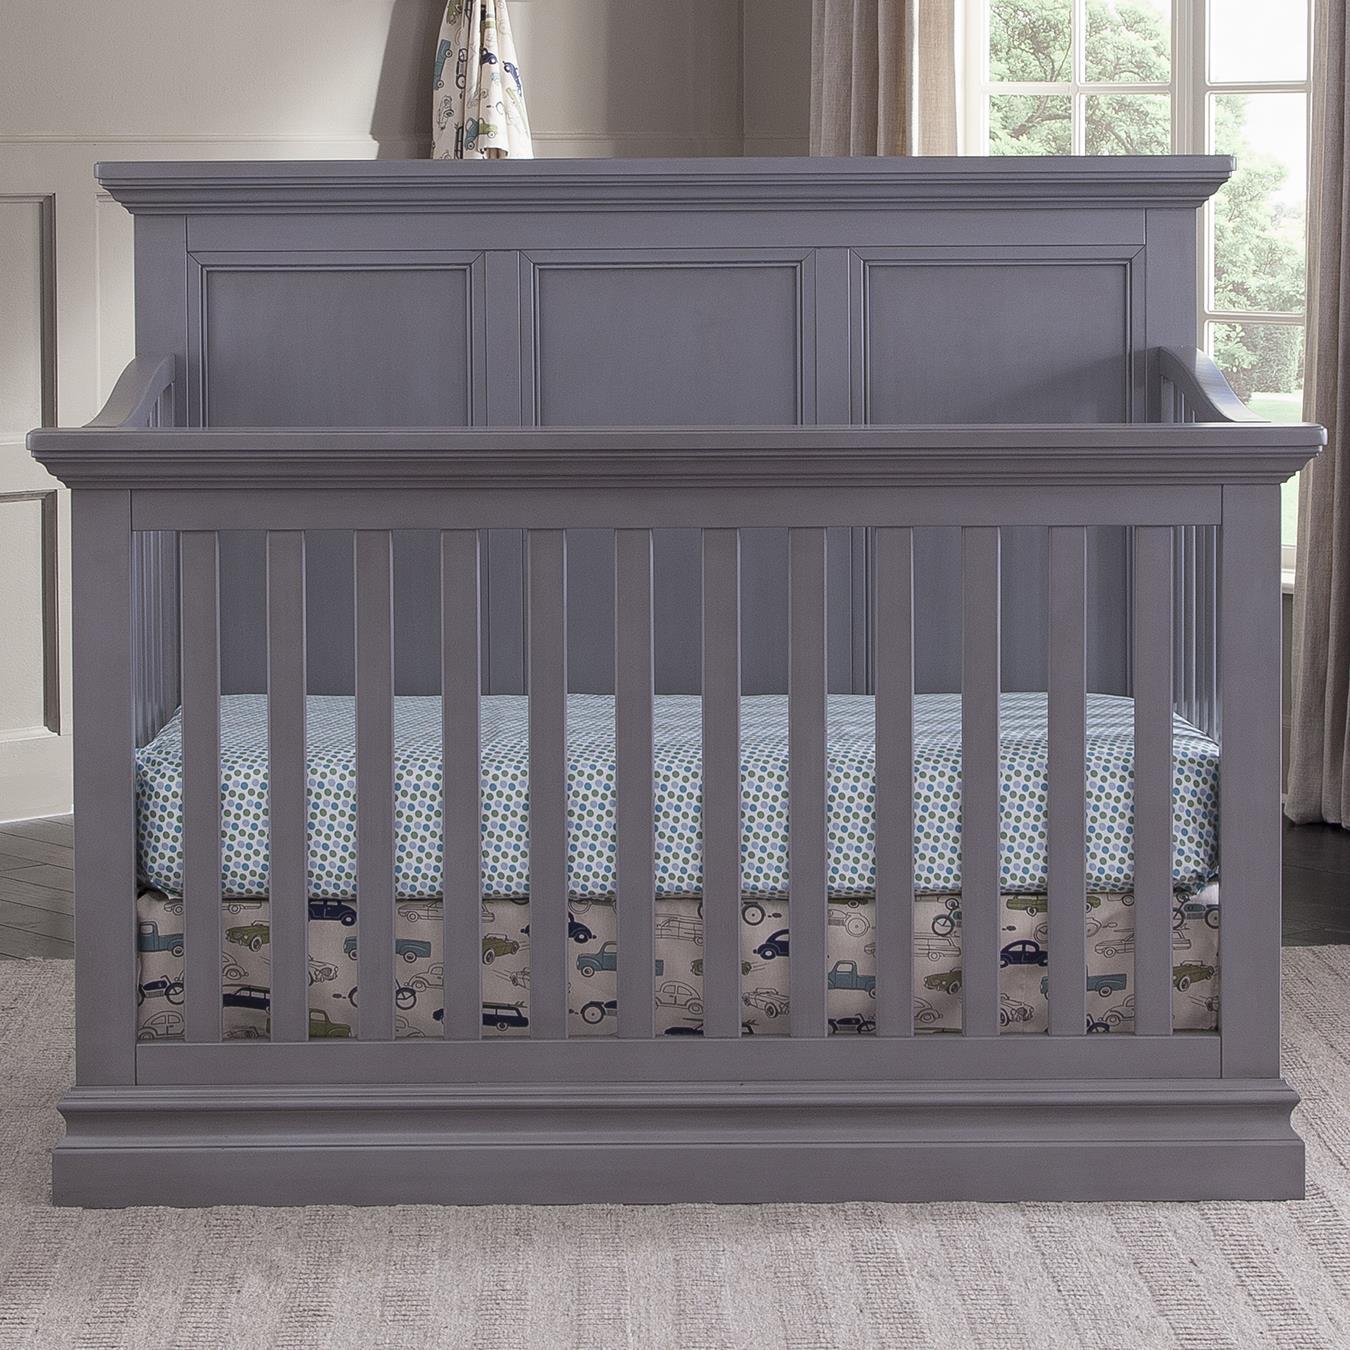 Westwood Design Pine Ridge Convertible Crib - Item Number: PR-CR-8004NR-CLD